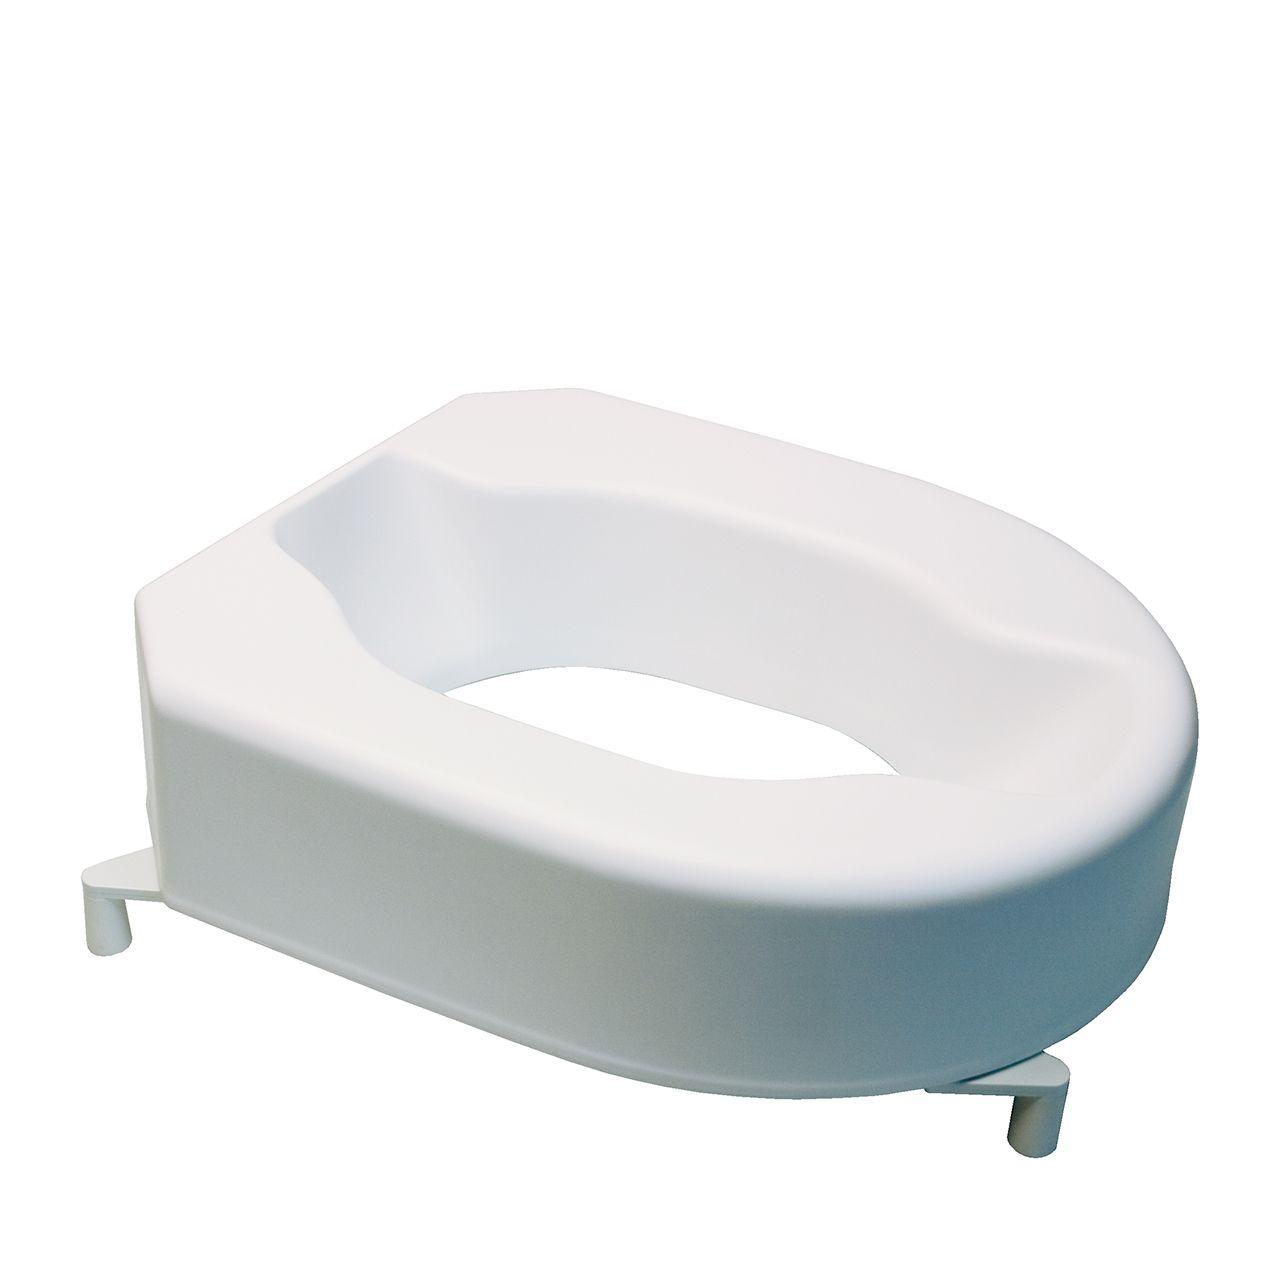 Hi-Loo afneembare toiletverhoger